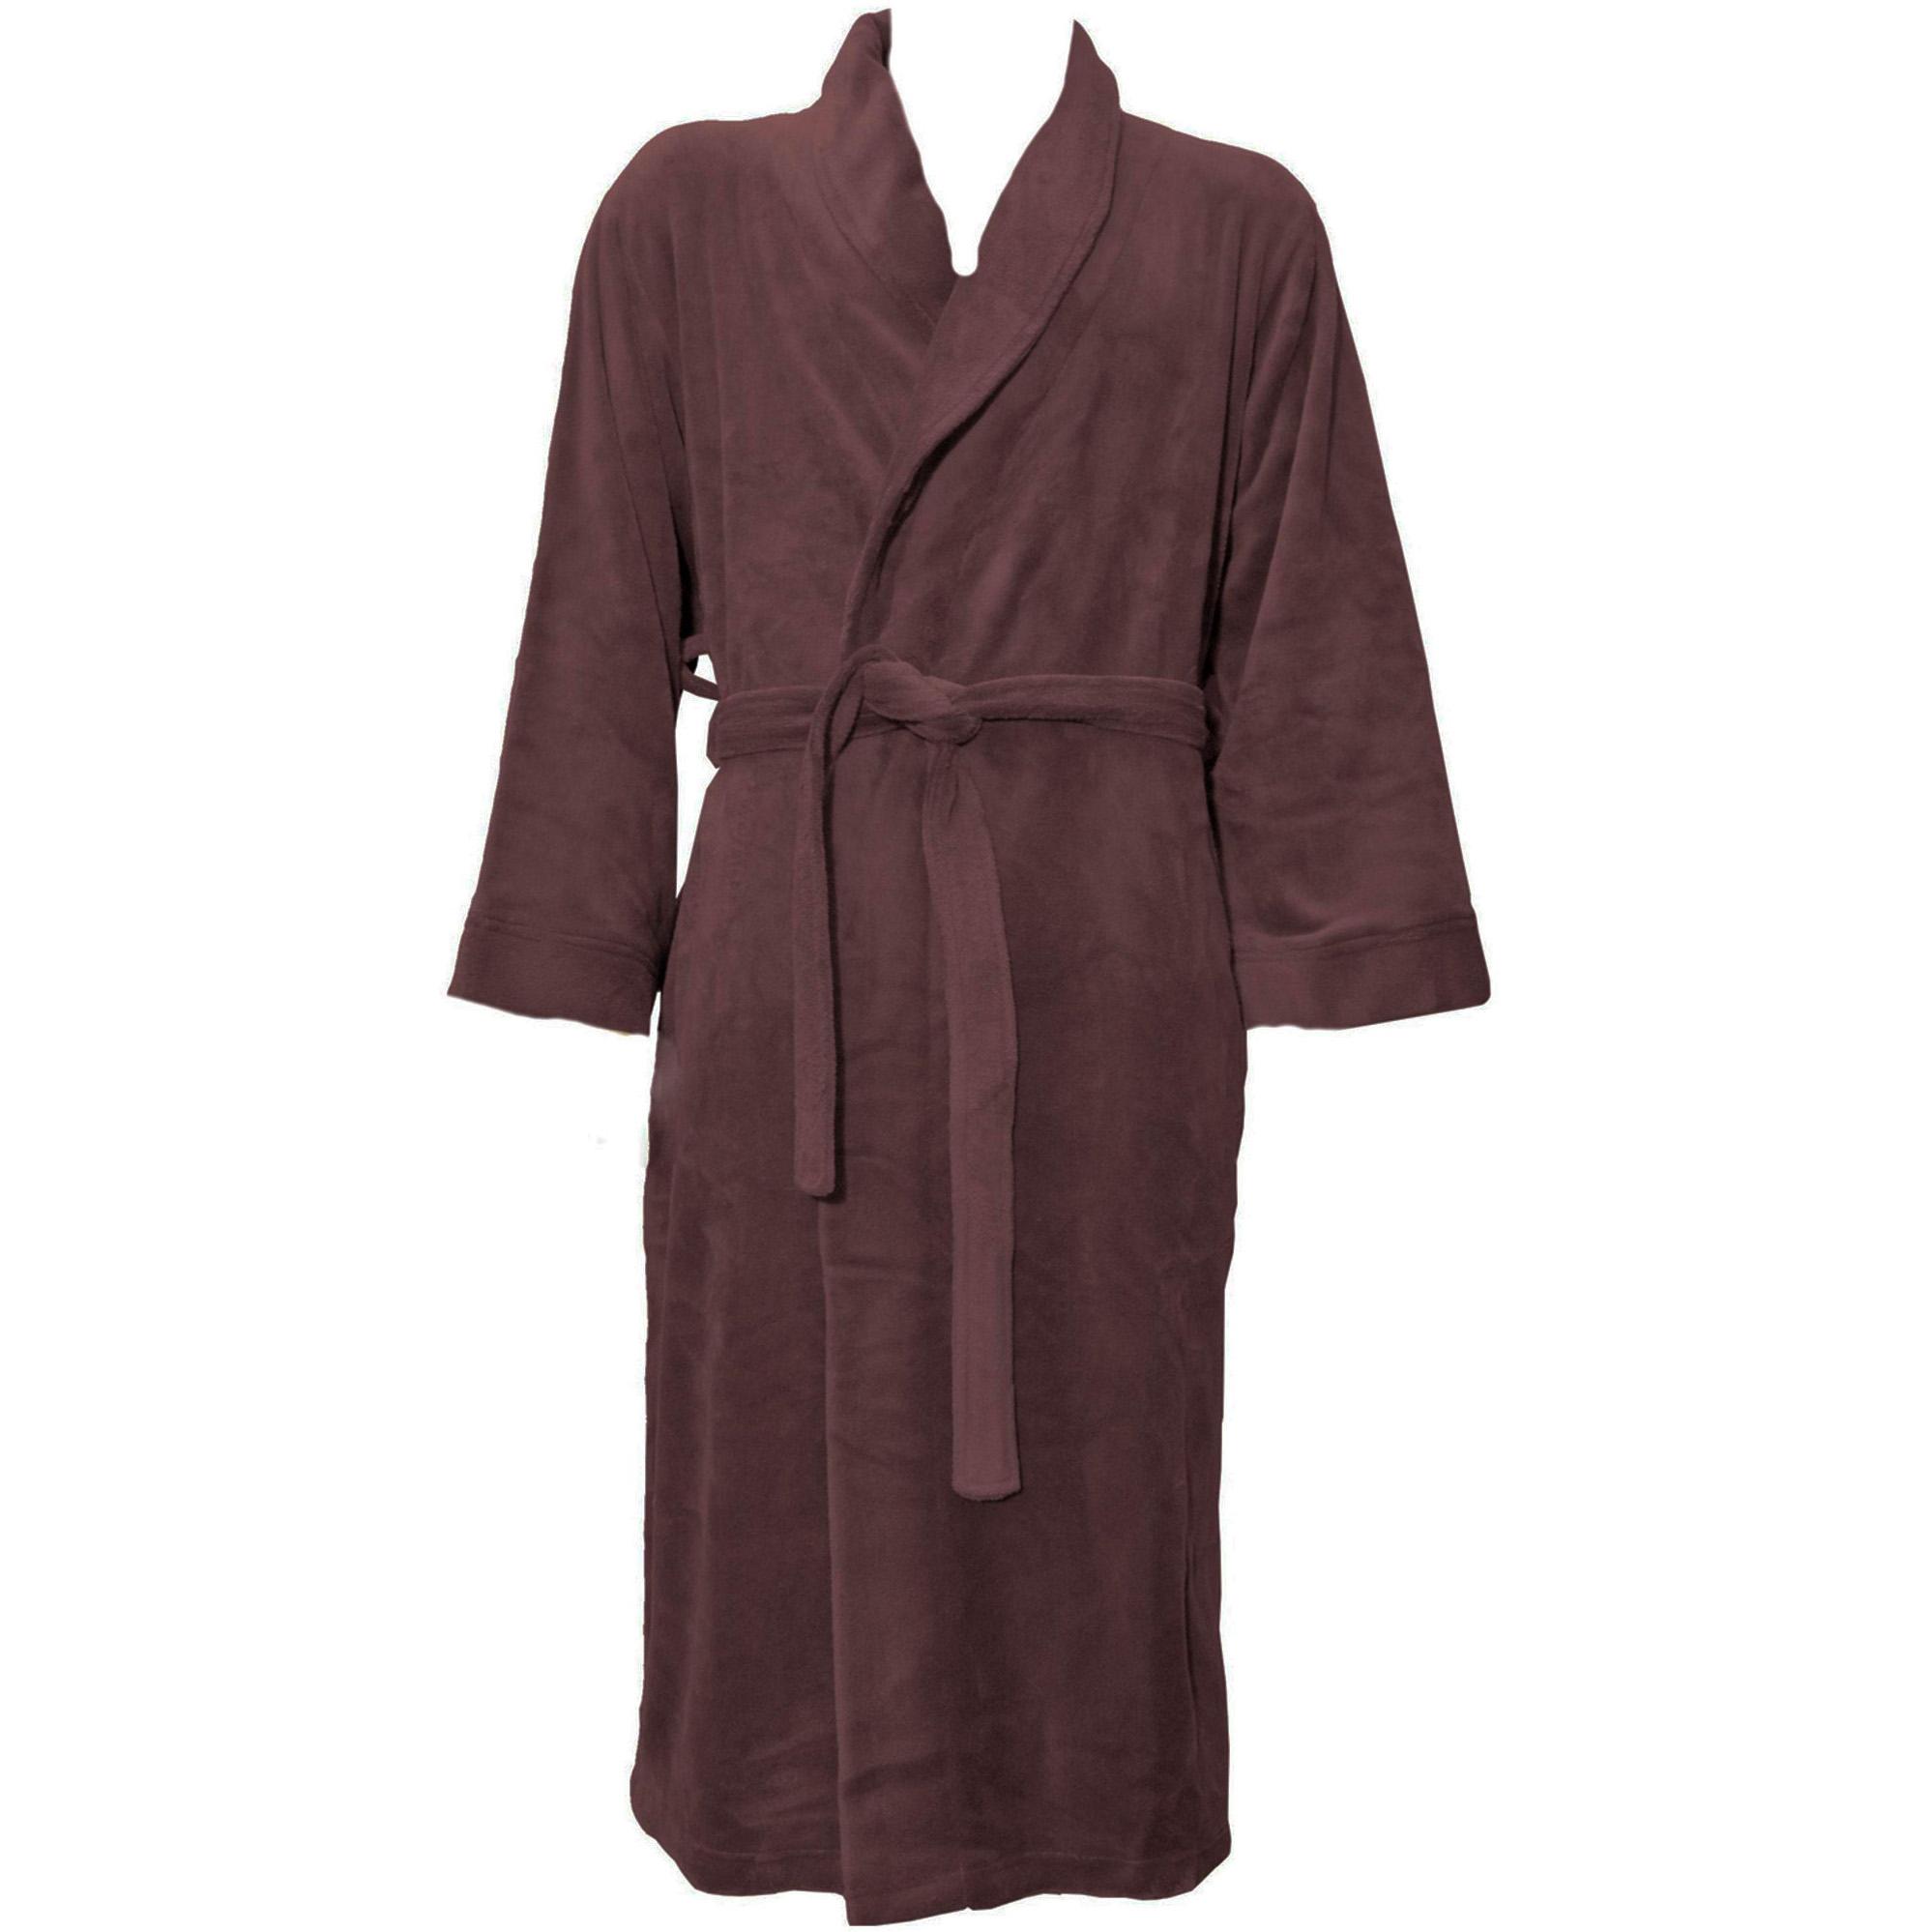 Simplicity Luxury Soft Plush Spa Wrap Long Bathrobe with ...